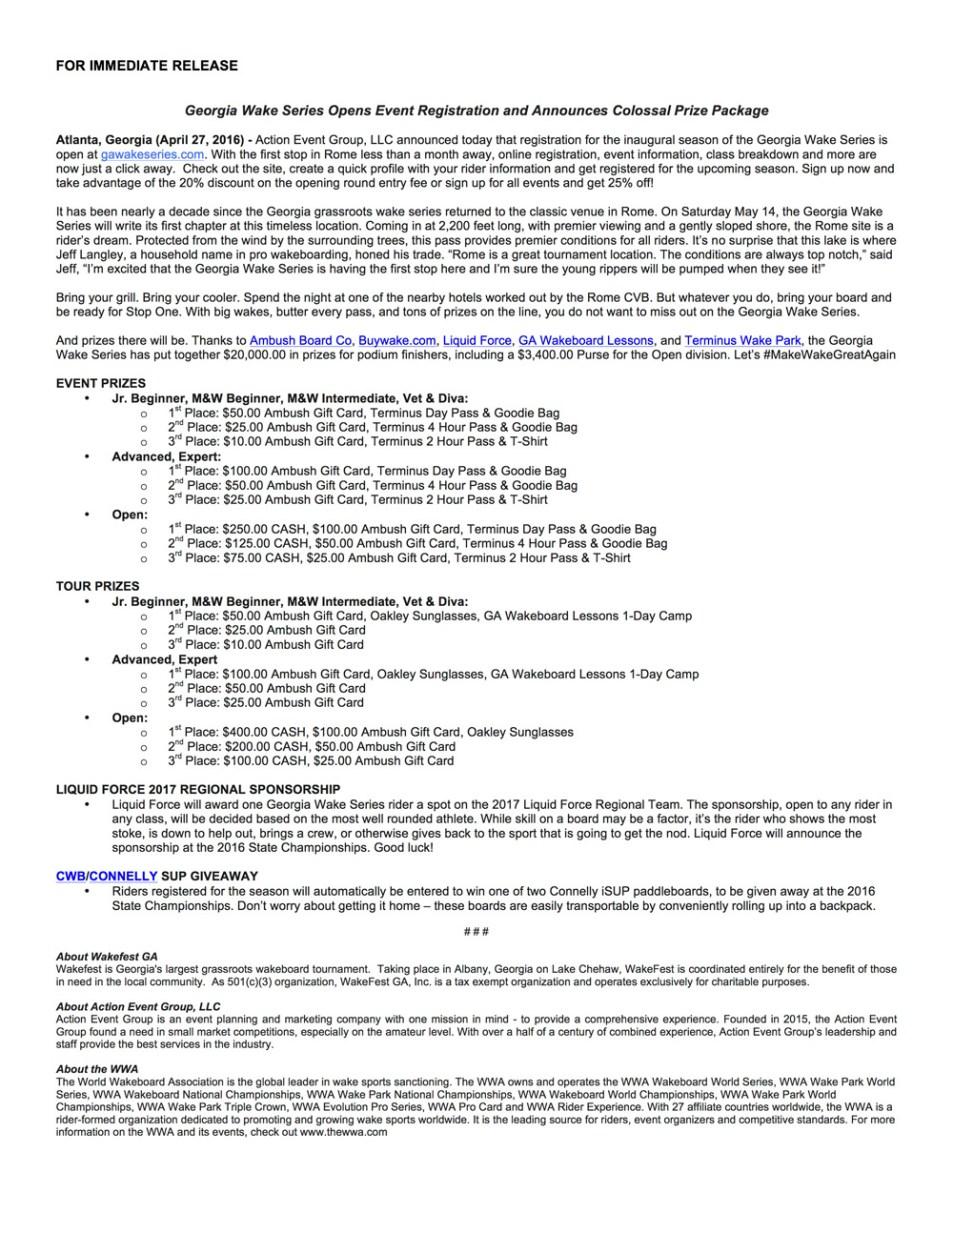 GAWS-Release-4-27-16